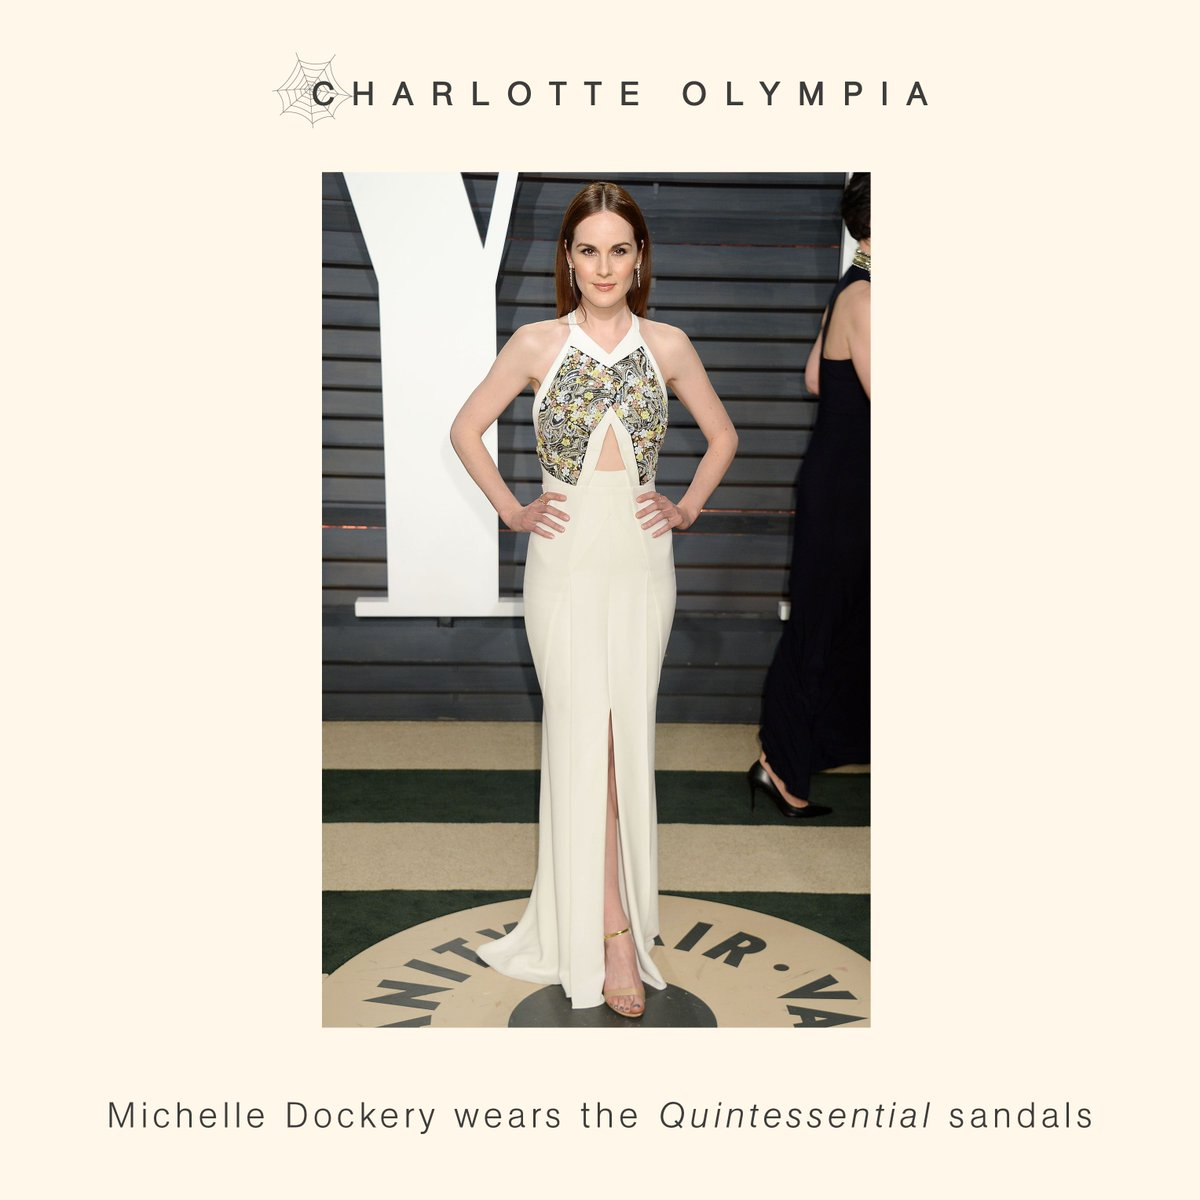 Charlotte Olympia Quintessential afXfKe